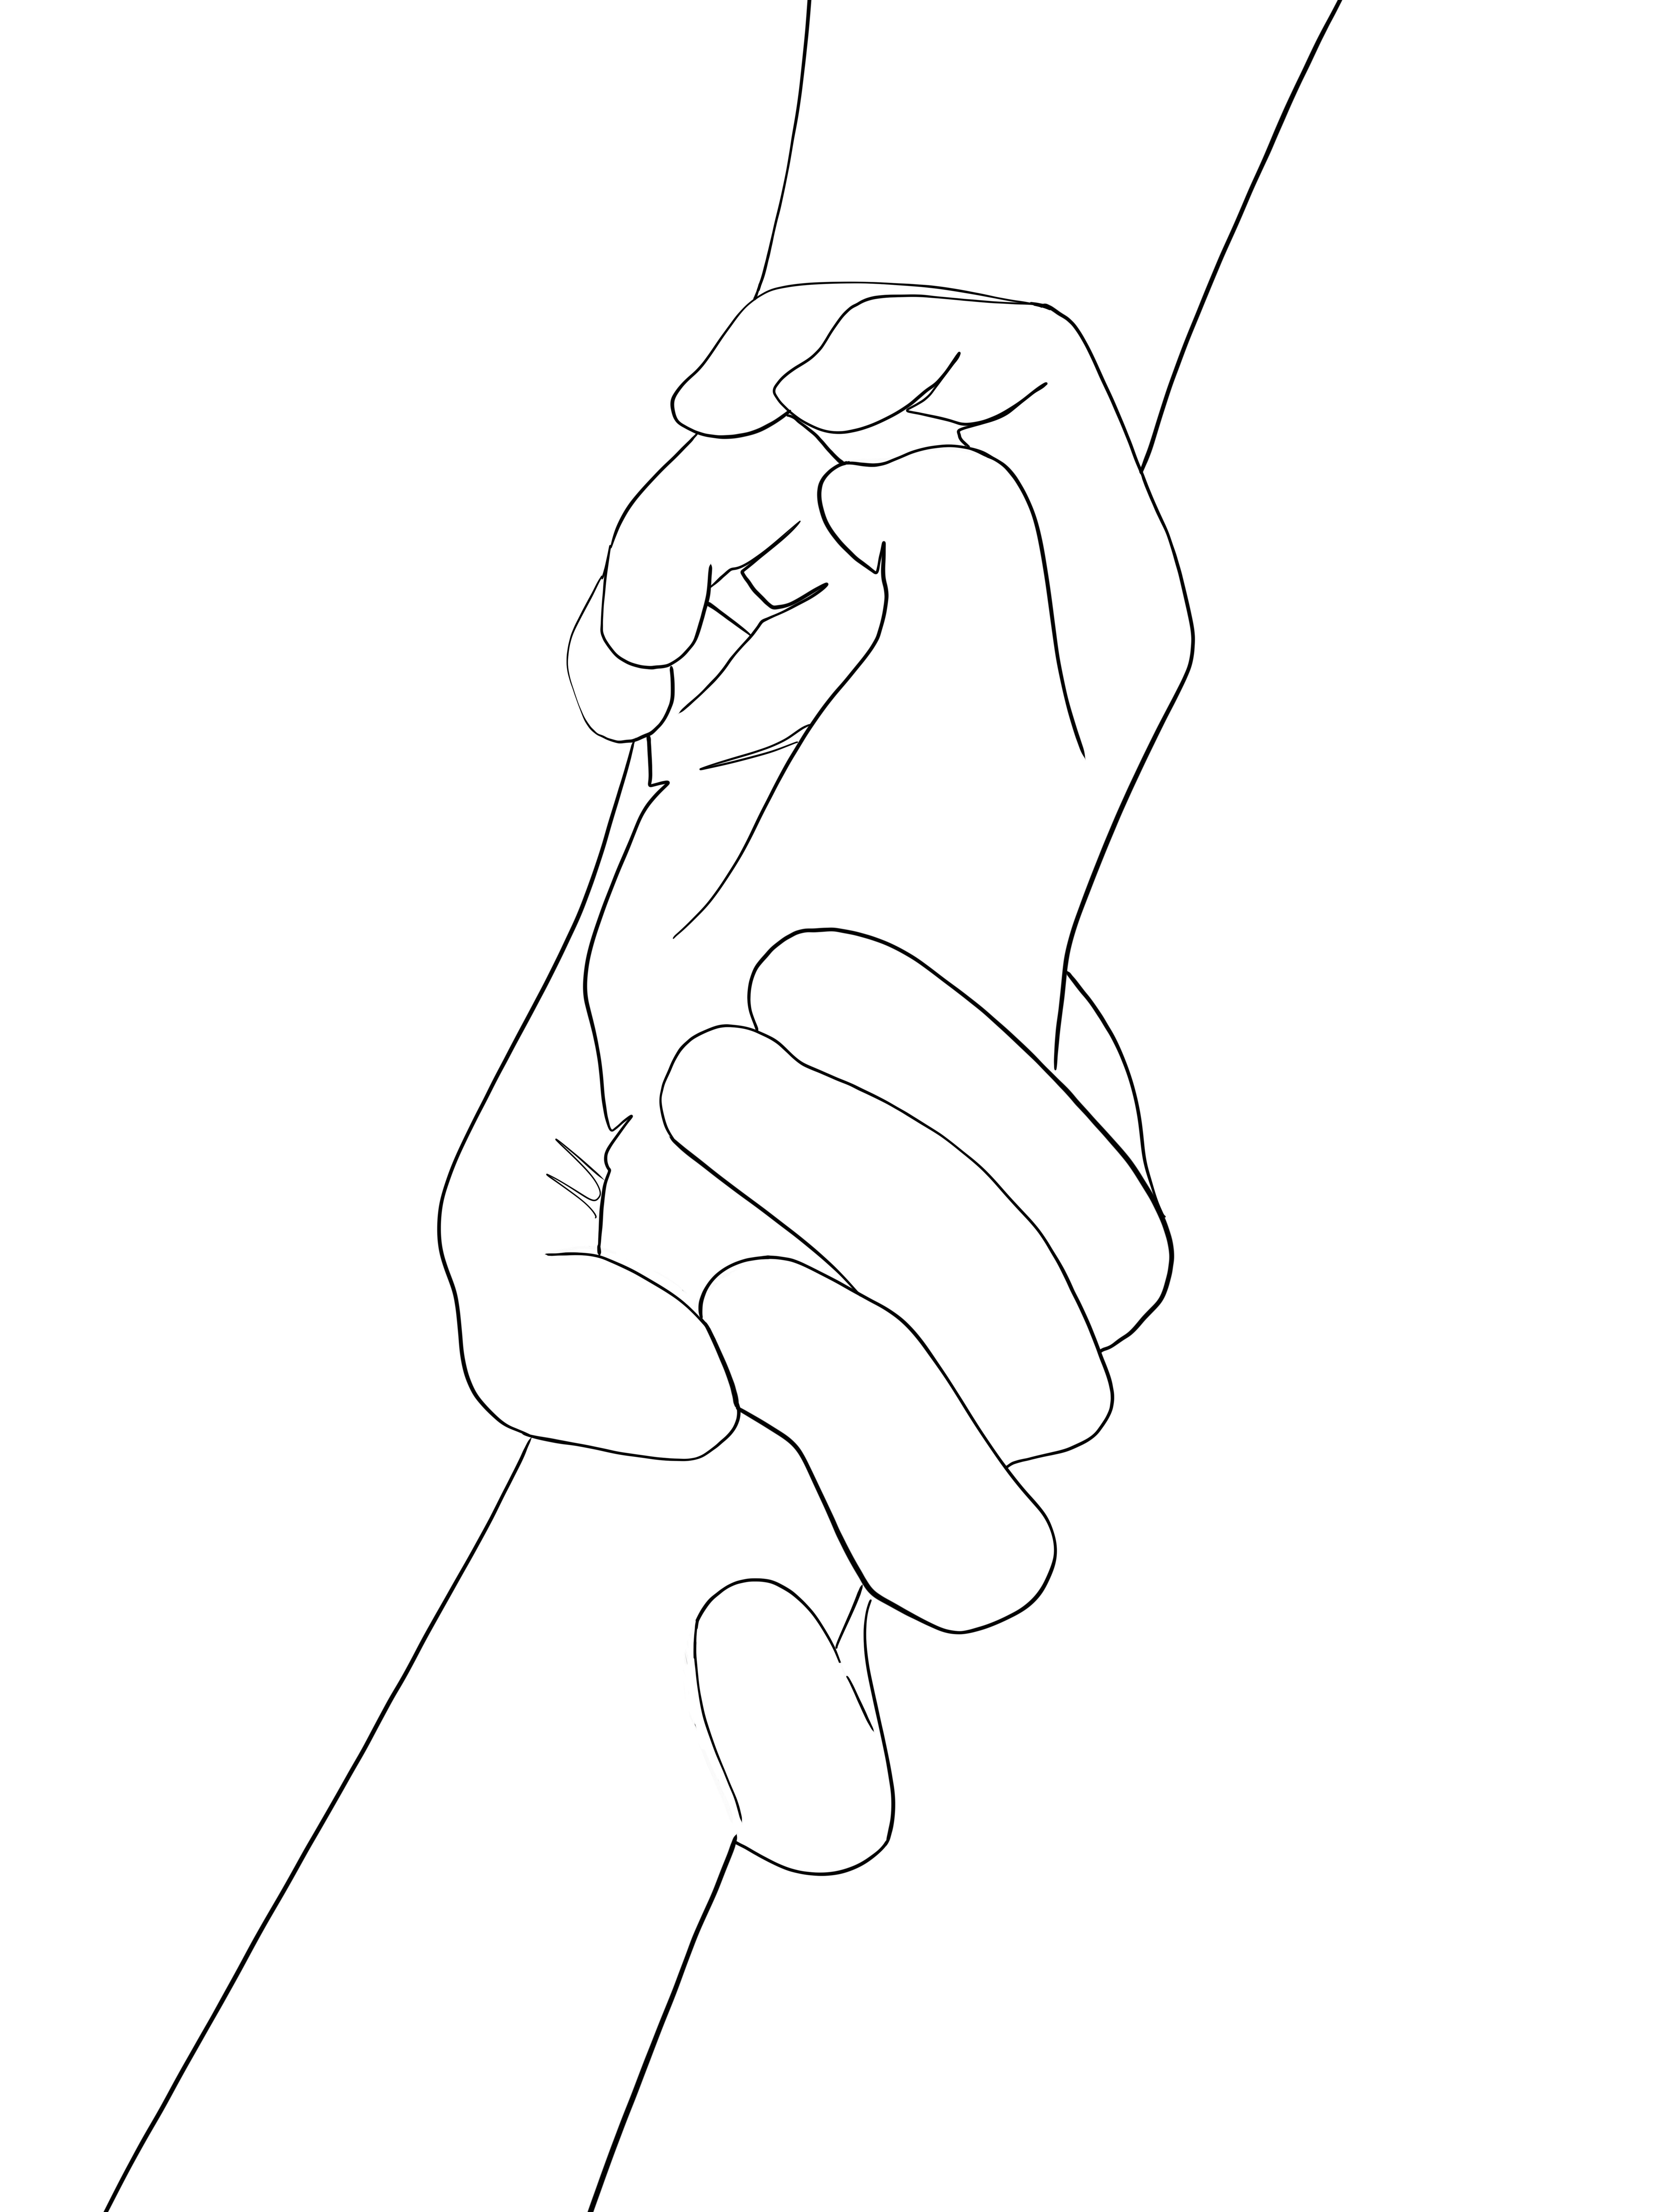 Line Art Sold At Society6 Com Minimaliste Line Art Simple Line Art Line Art Drawings Line Art Peopl Line Art Flowers Abstract Line Art Line Art Drawings